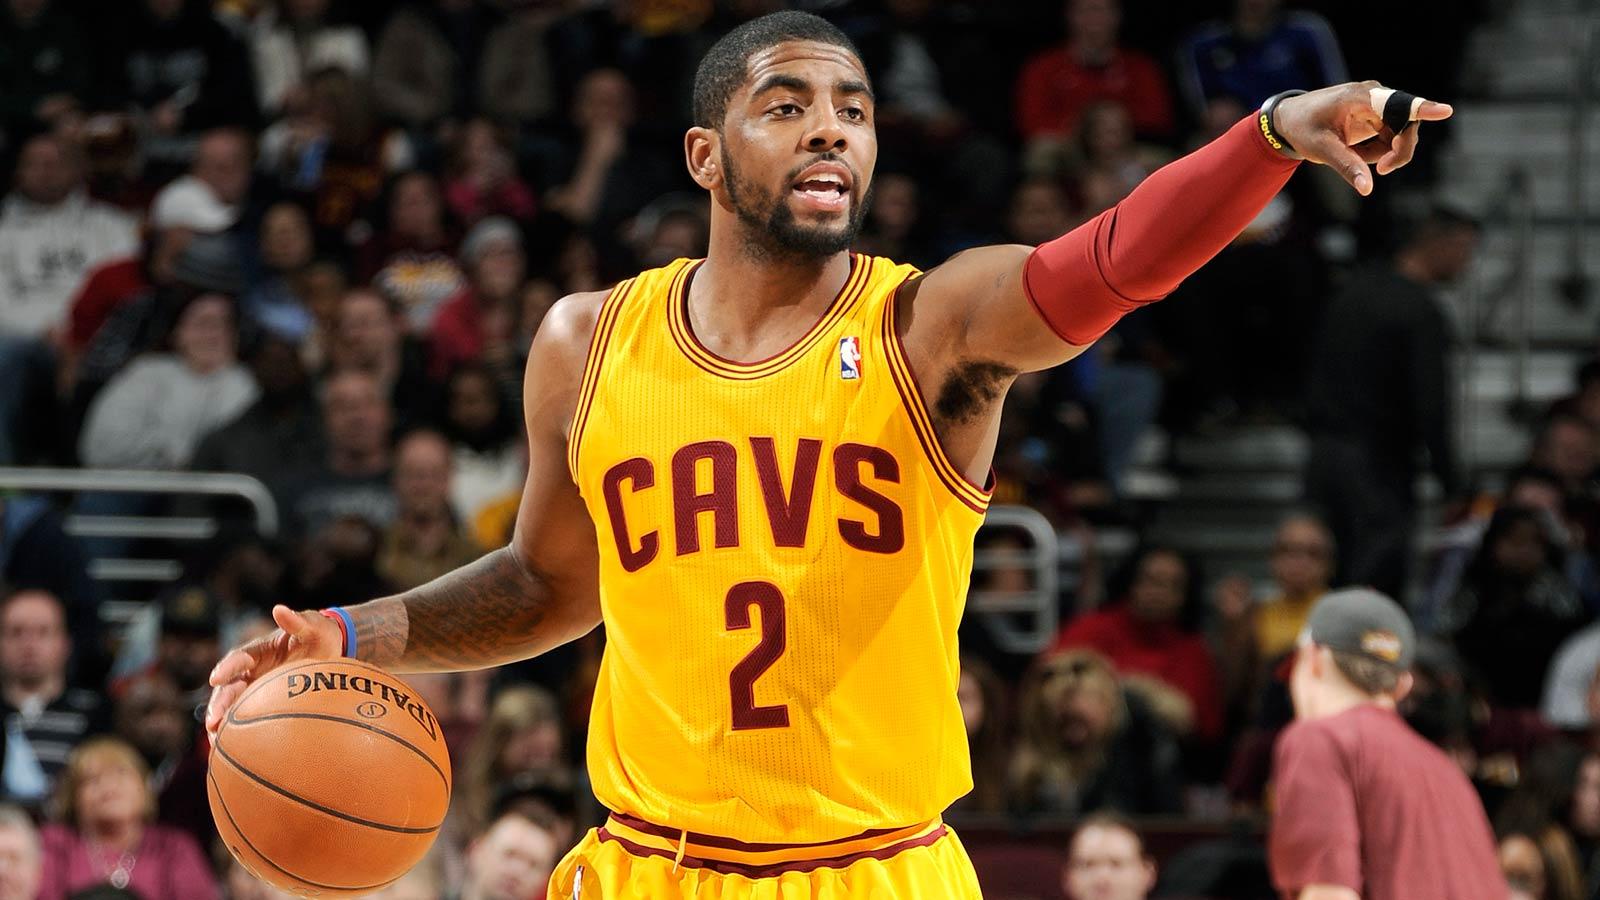 Nike Basketball Hd Wallpaper Eastern All Stars Kyrie Irving Play It Usa